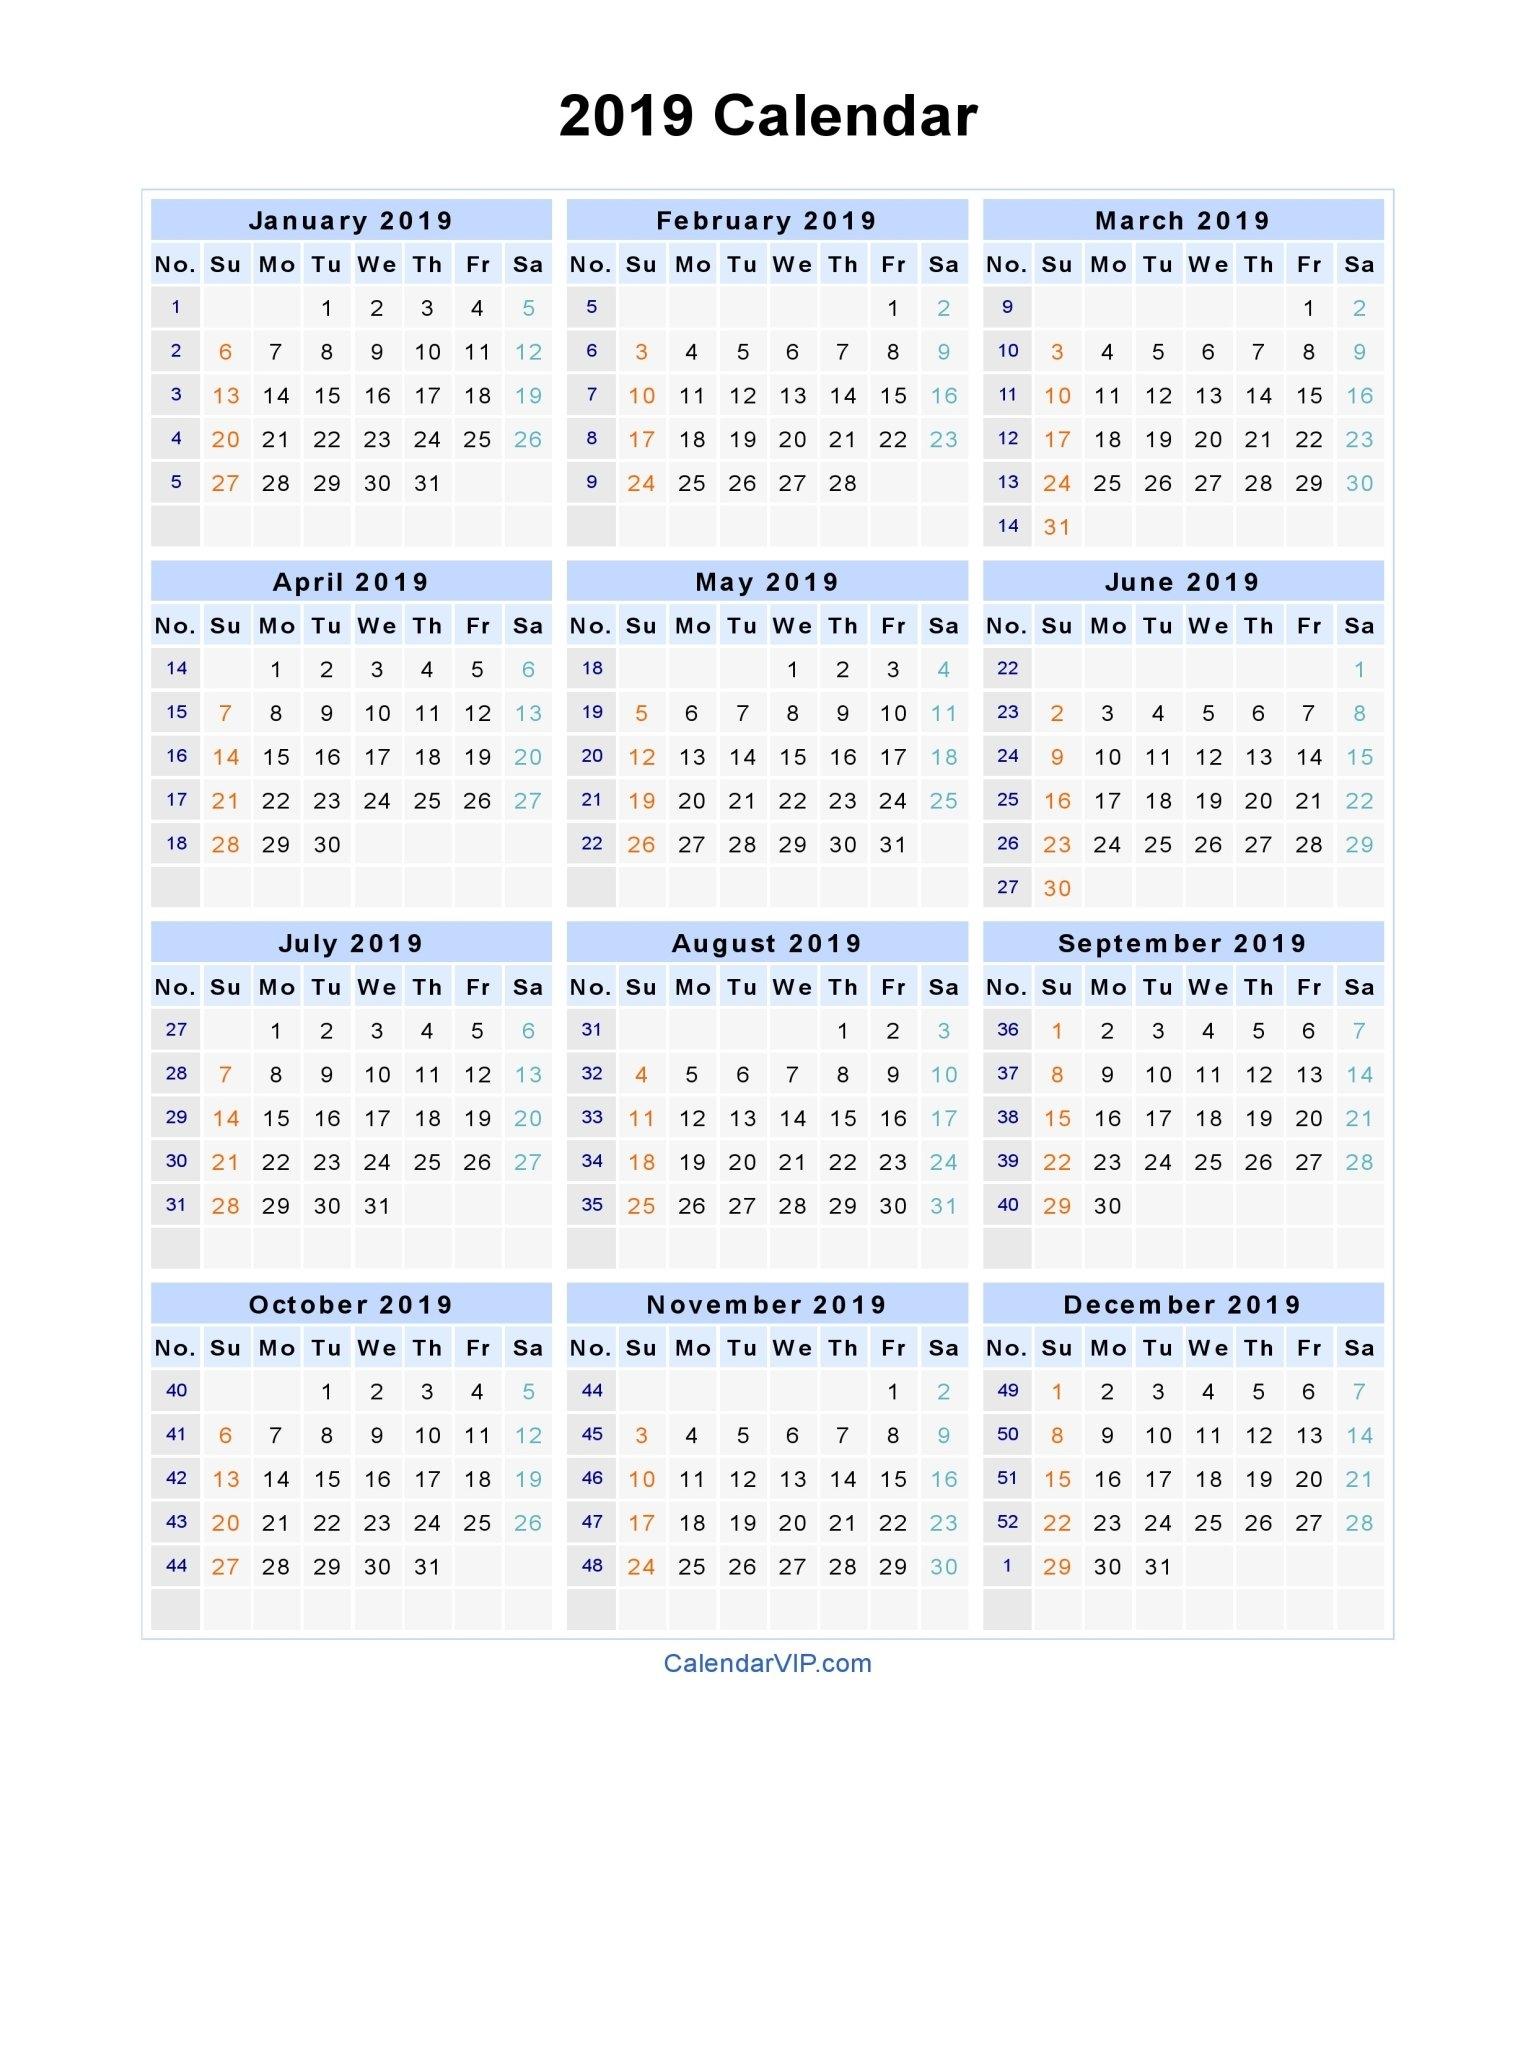 2019 Calendar – Blank Printable Calendar Template In Pdf Word Excel Calendar 2019 Doc